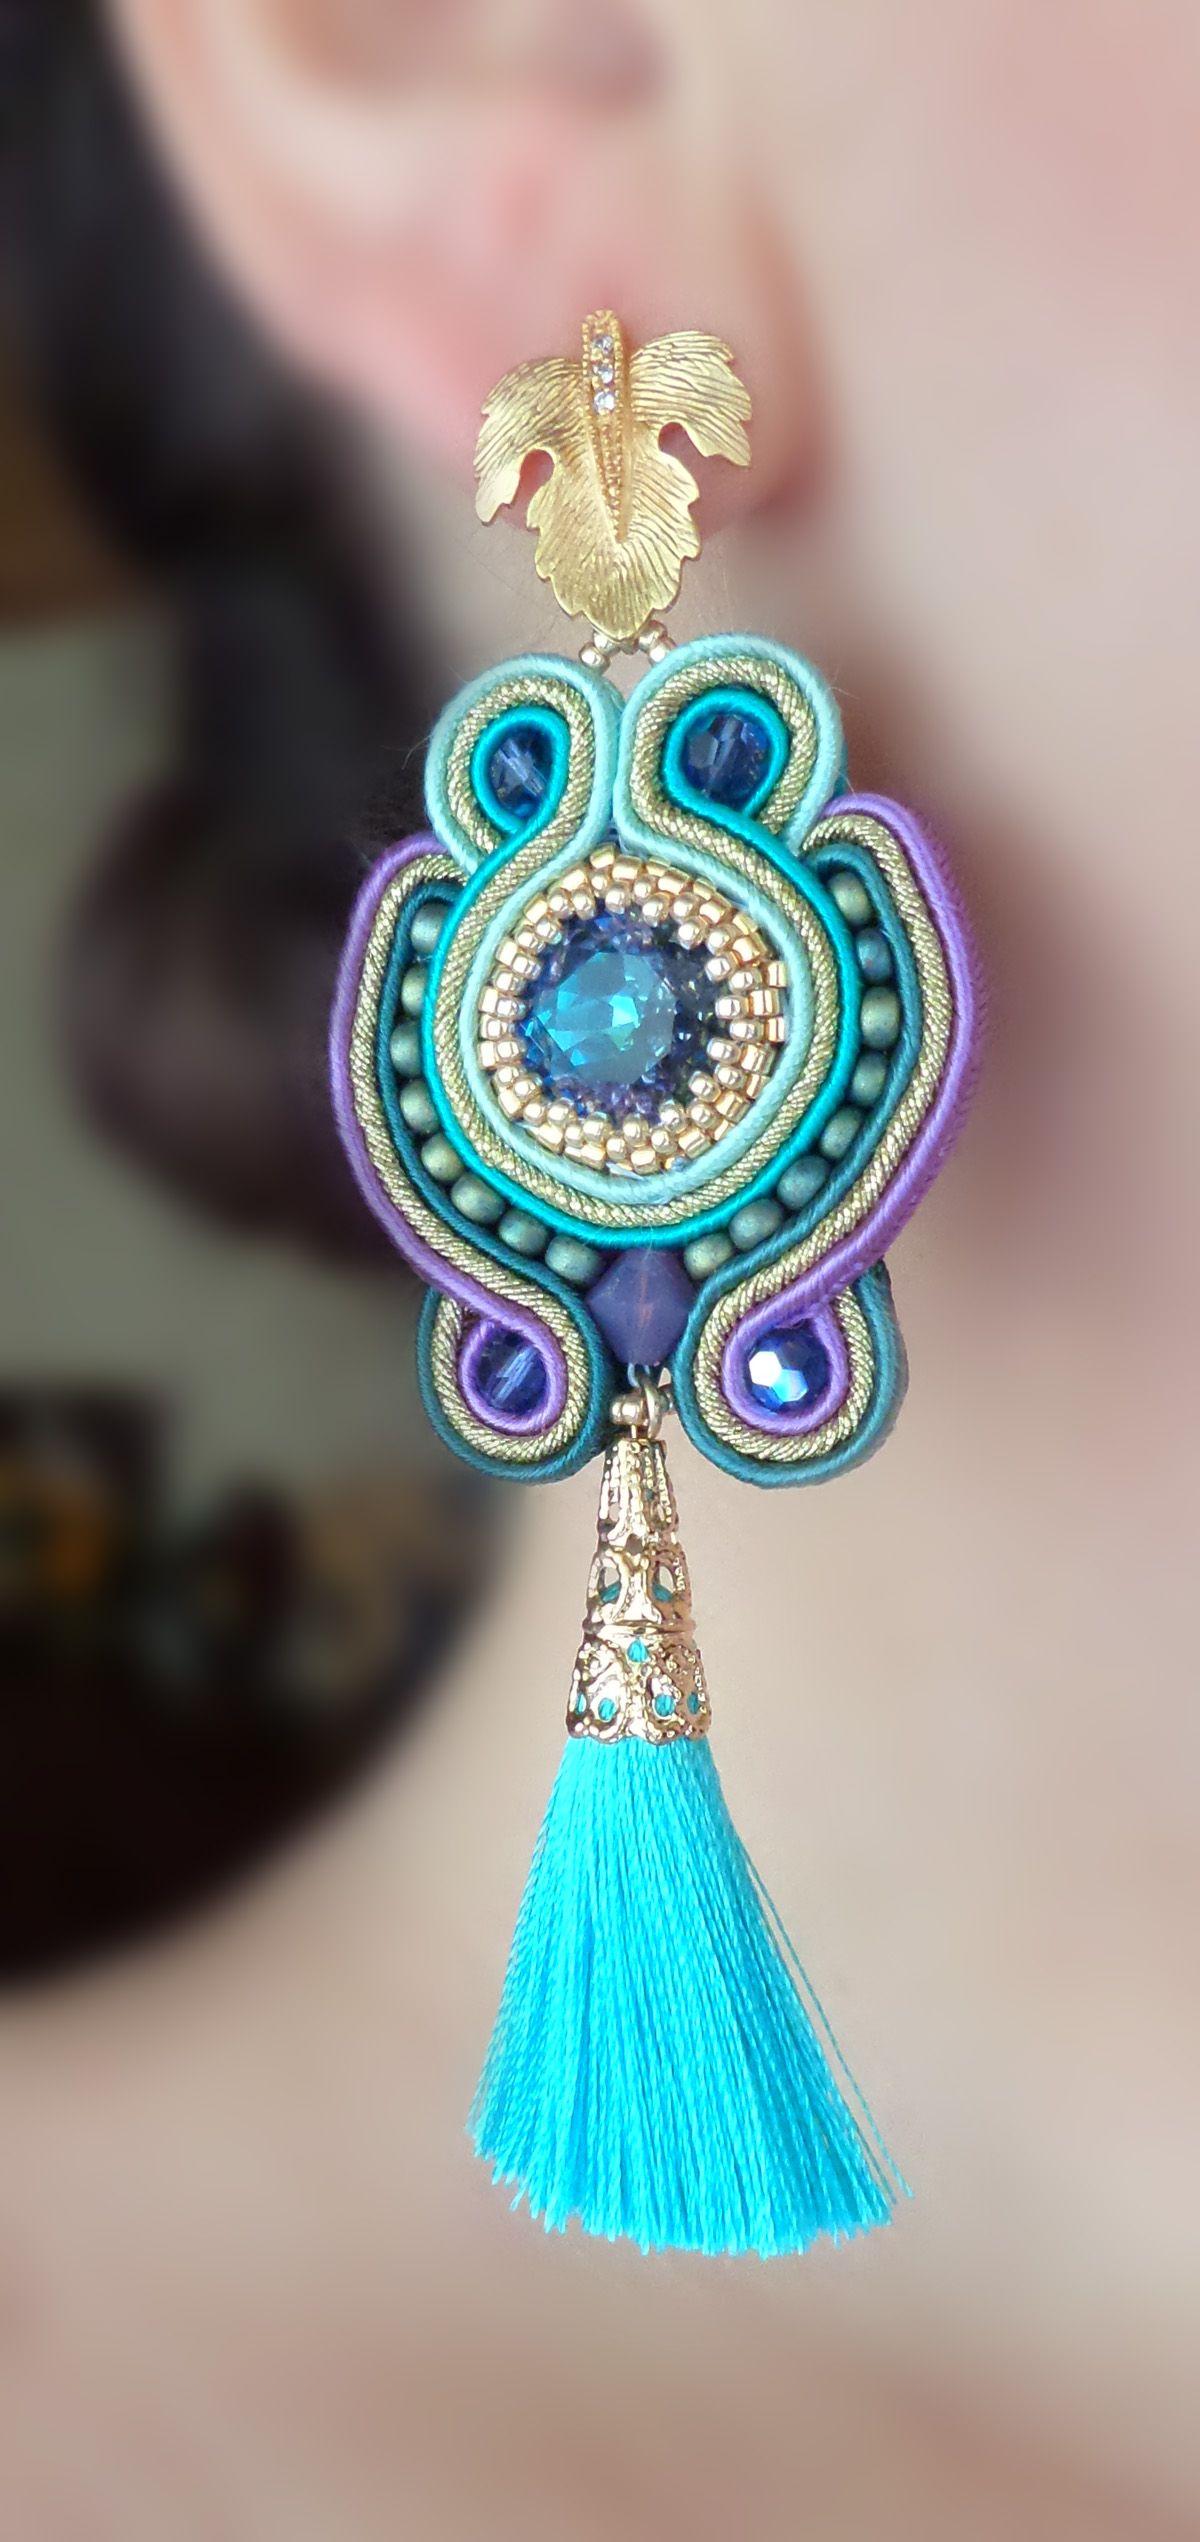 d5f01099eeaa Soutache EARRINGS design by Serena Di Mercione Bisuteria Aretes